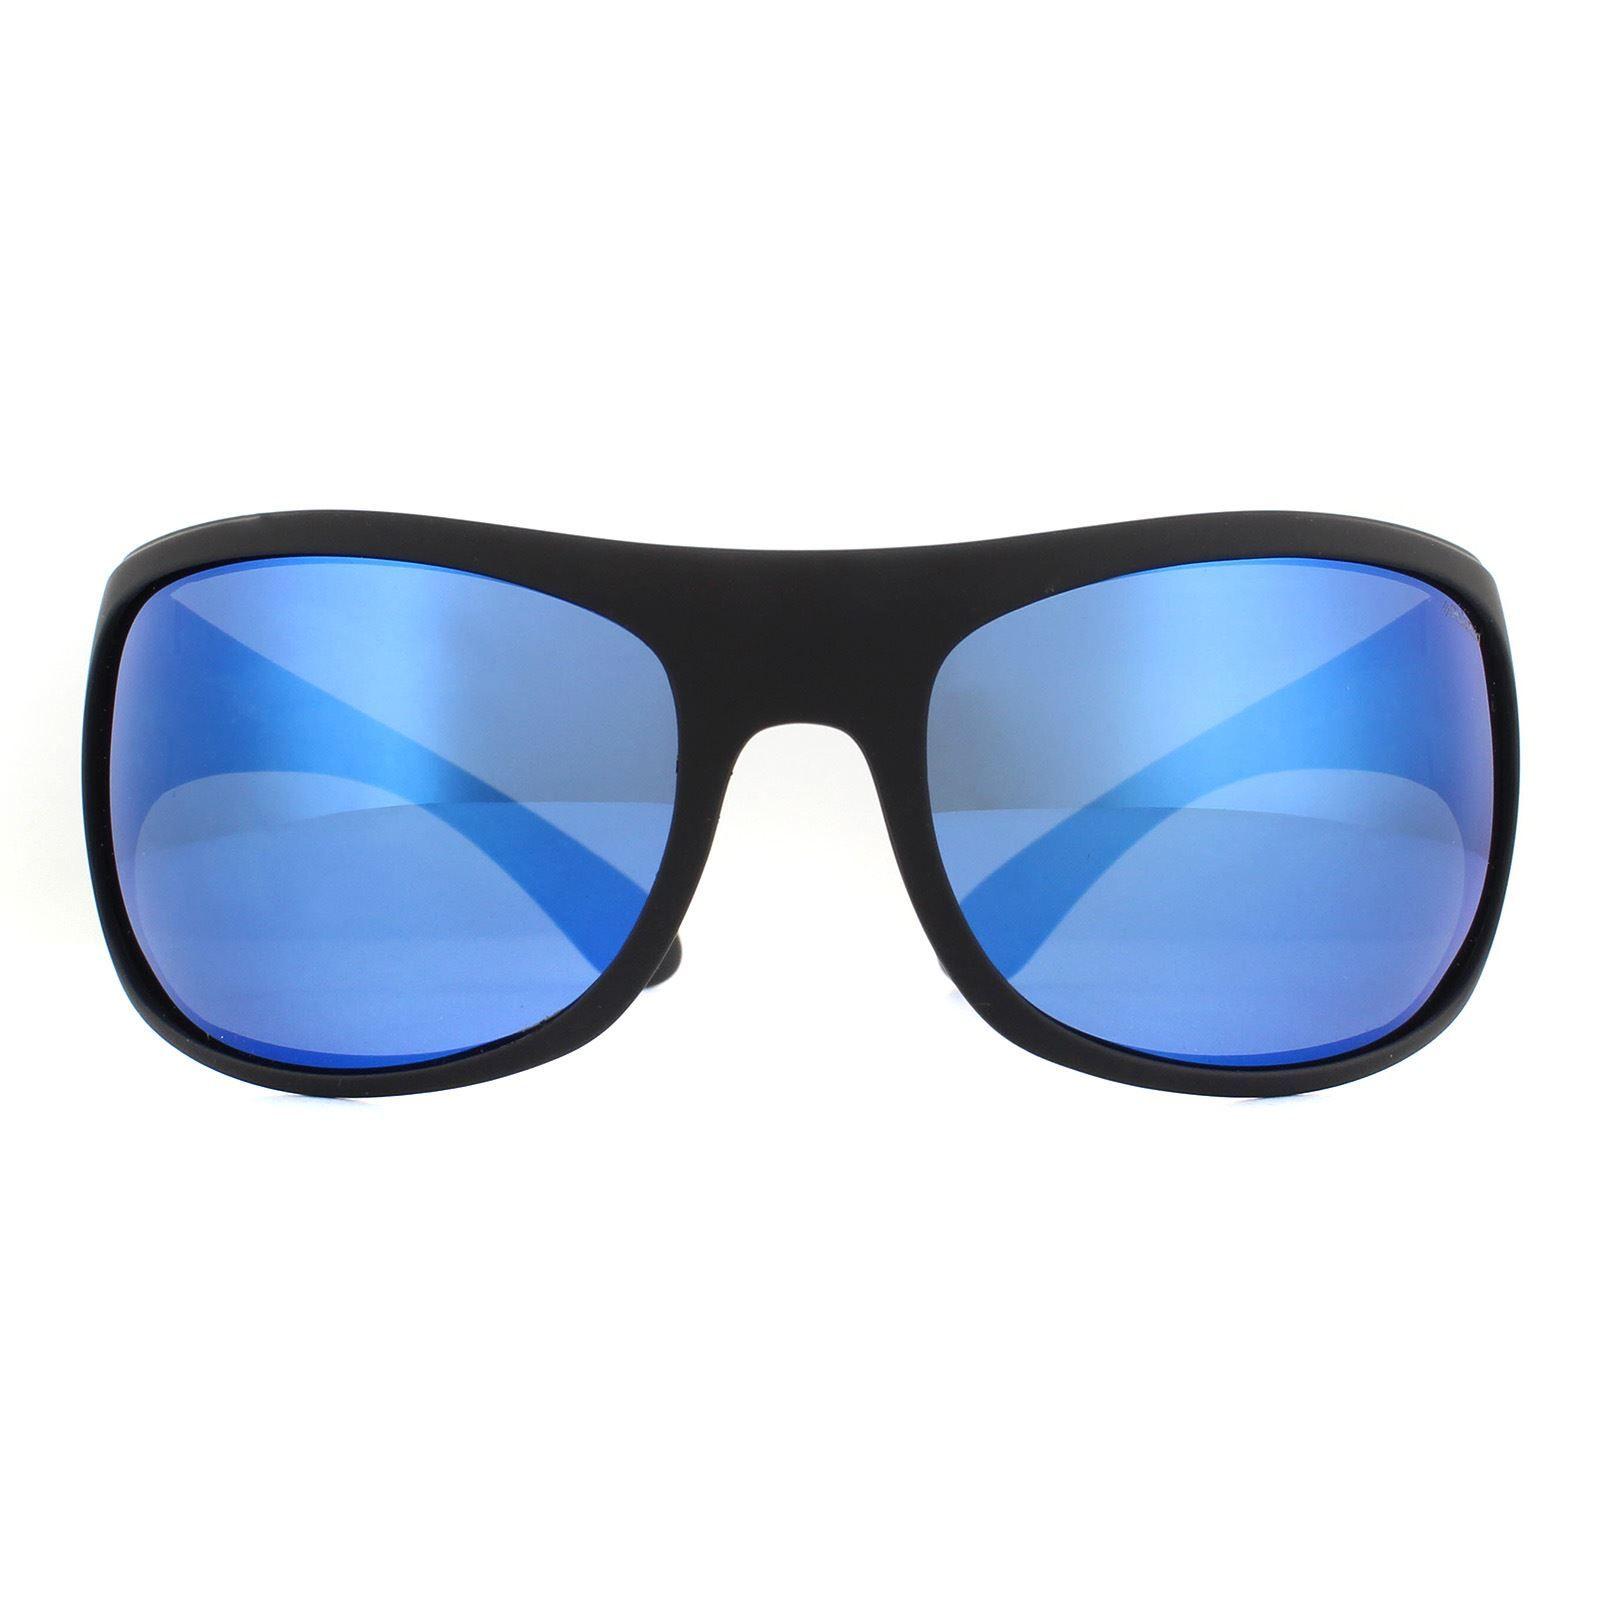 Polaroid Sunglasses 07886 003 5X Matte Black Blue Polarized